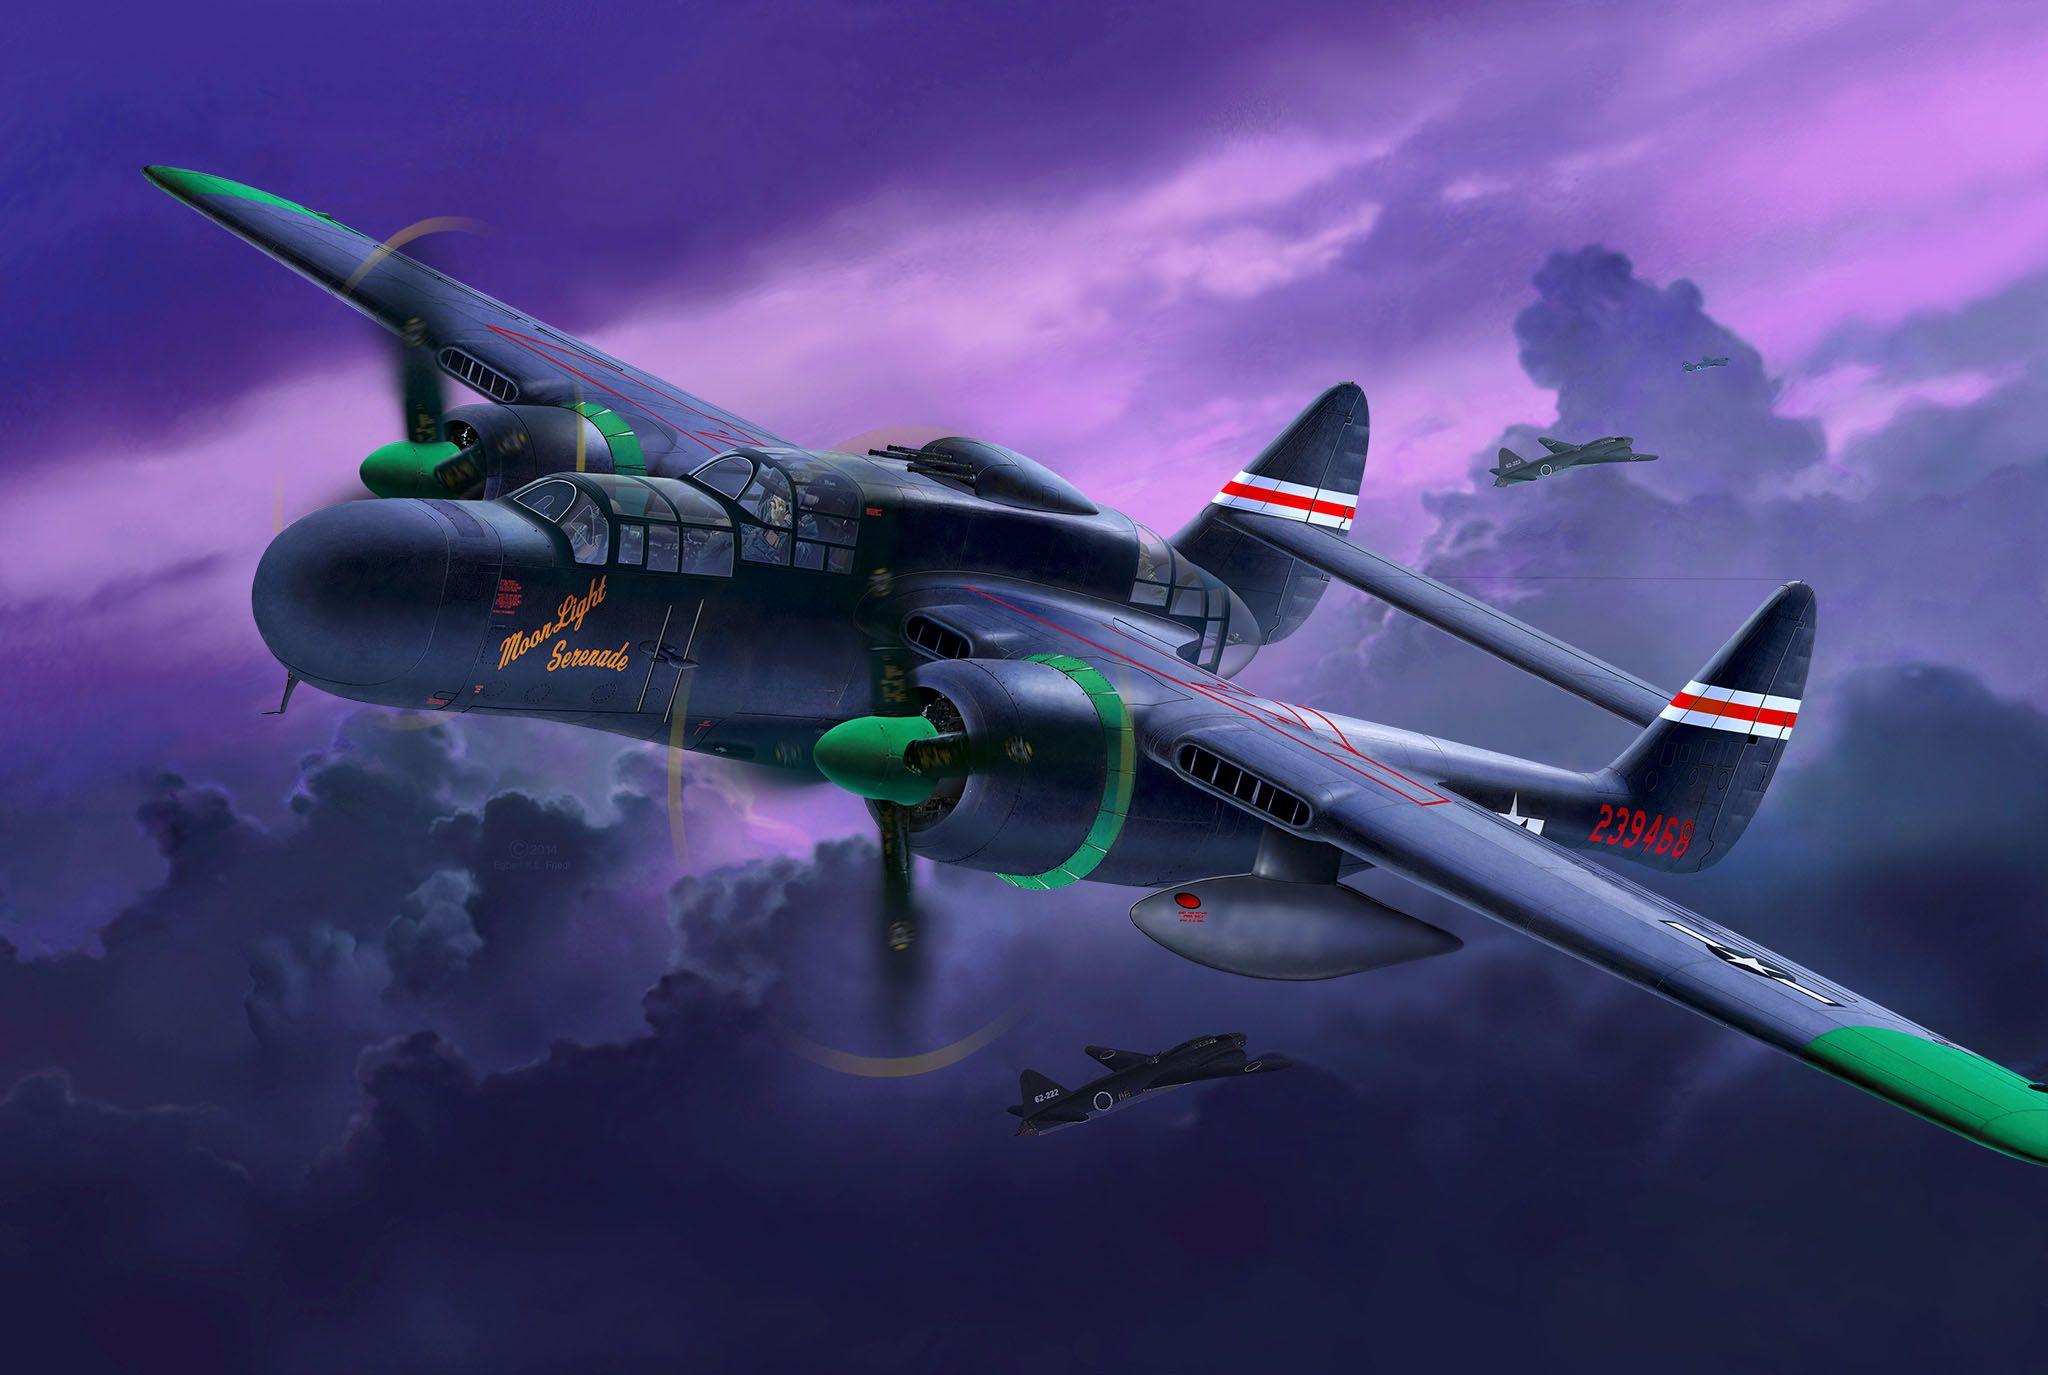 Обои p-61, ww2, black widow, painting, истребитель, P-61 black widow, aircraft art. Авиация foto 8